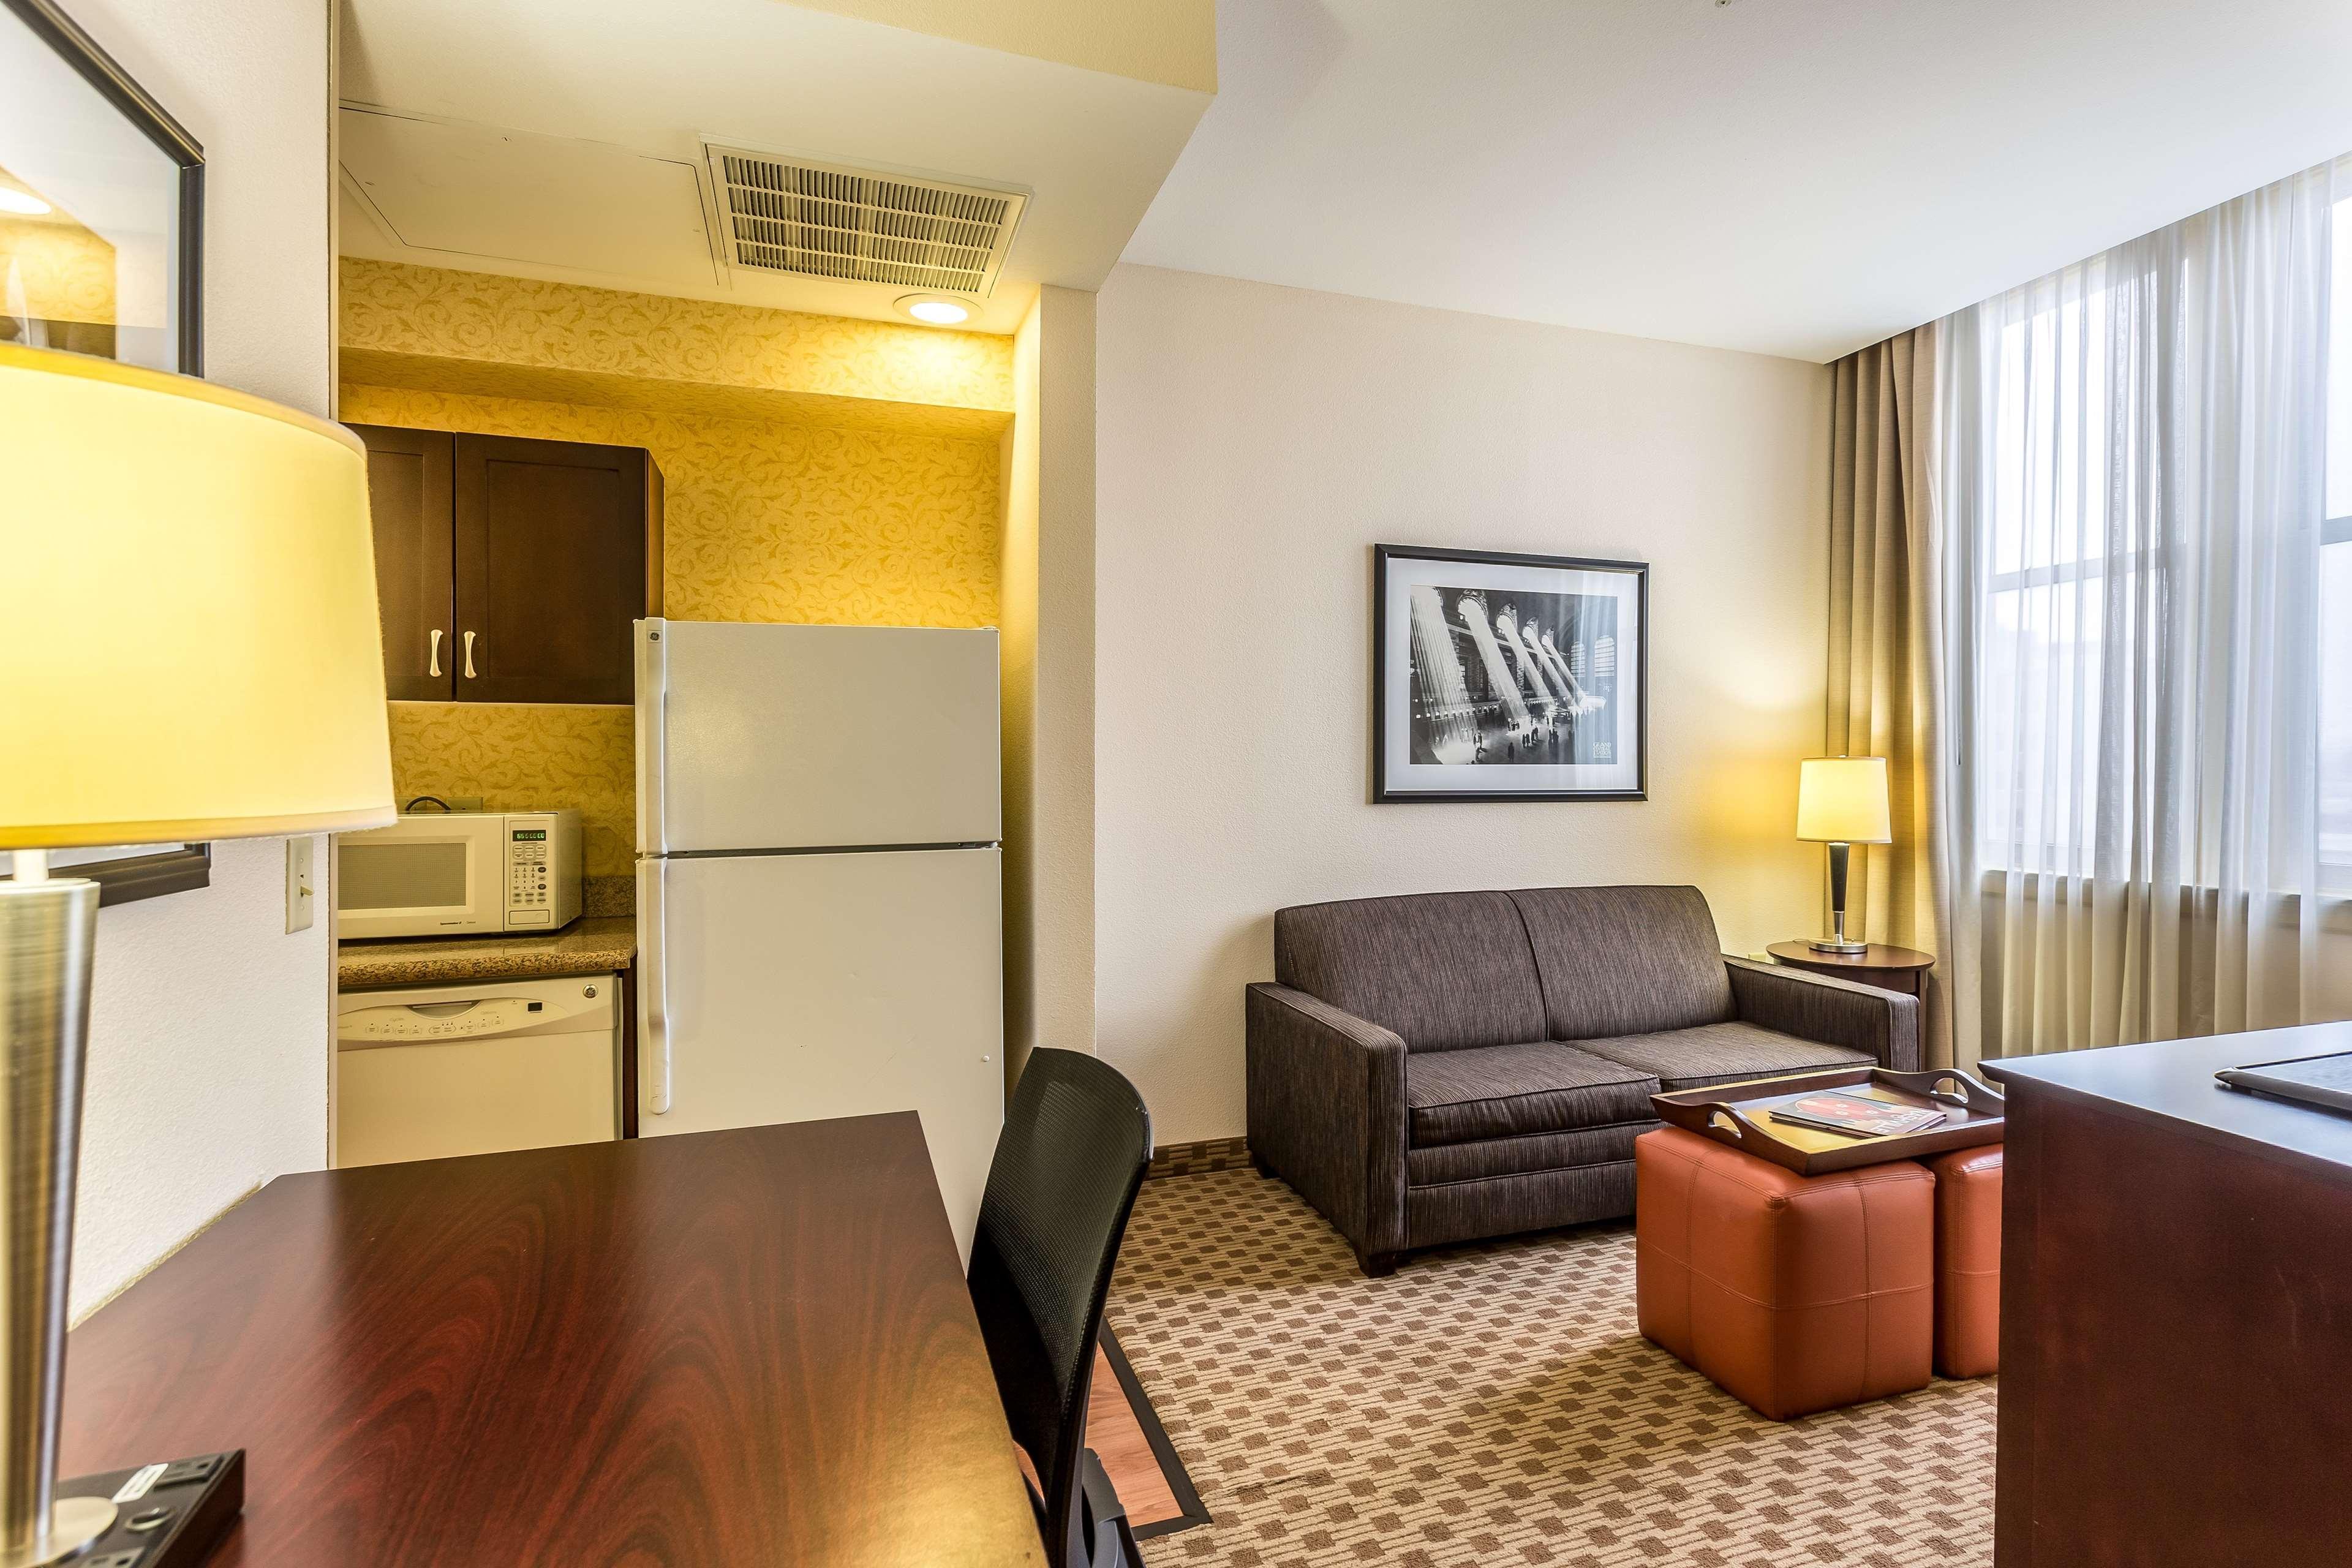 Homewood Suites by Hilton Nashville-Downtown image 13